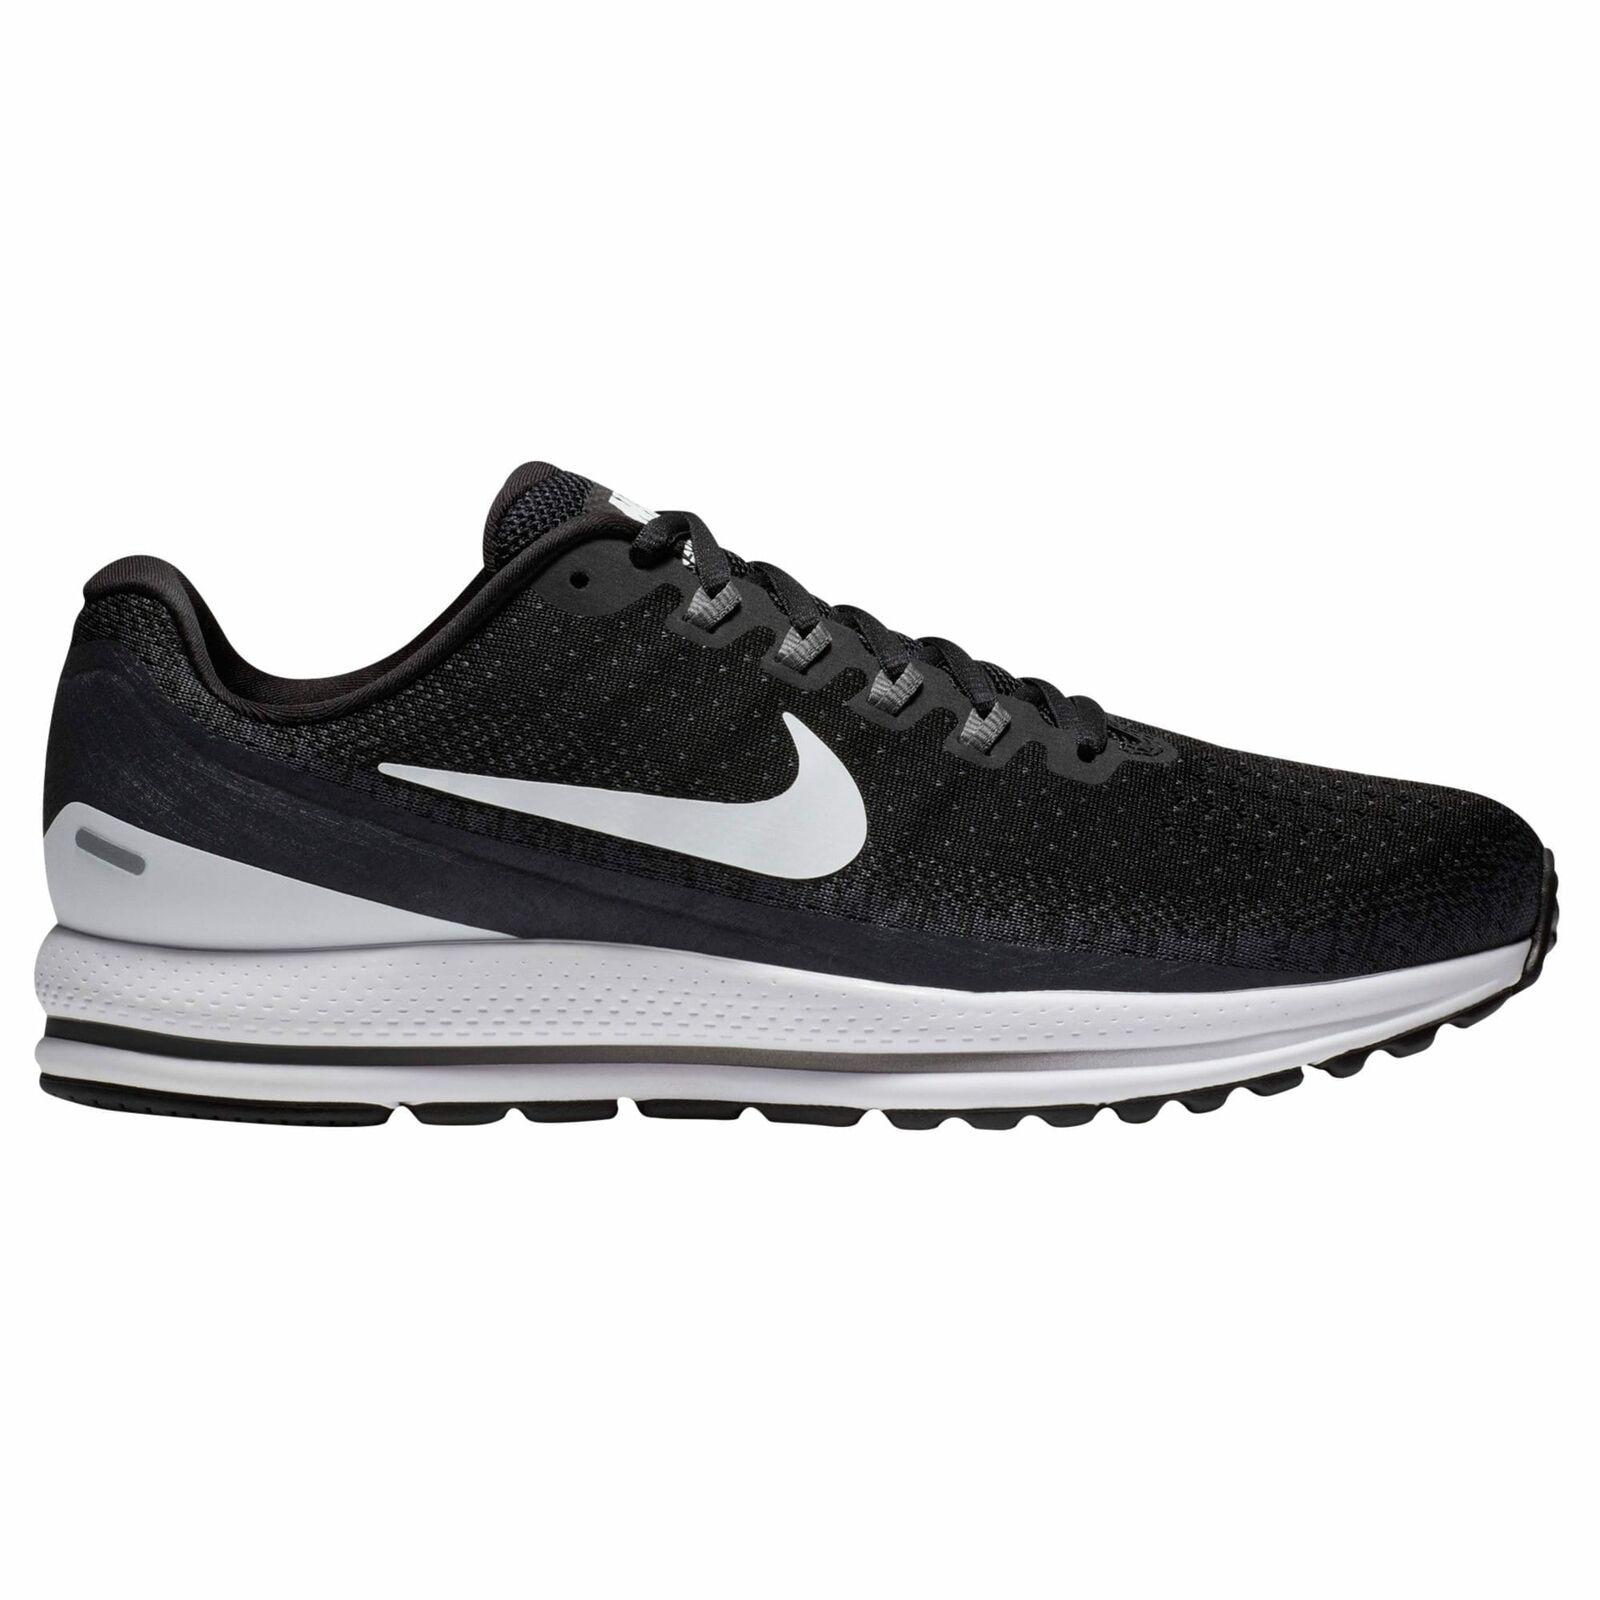 Nike Air Zoom Vomero 13 Men's nero  bianca   Anthracite 4284001  risparmiare sulla liquidazione